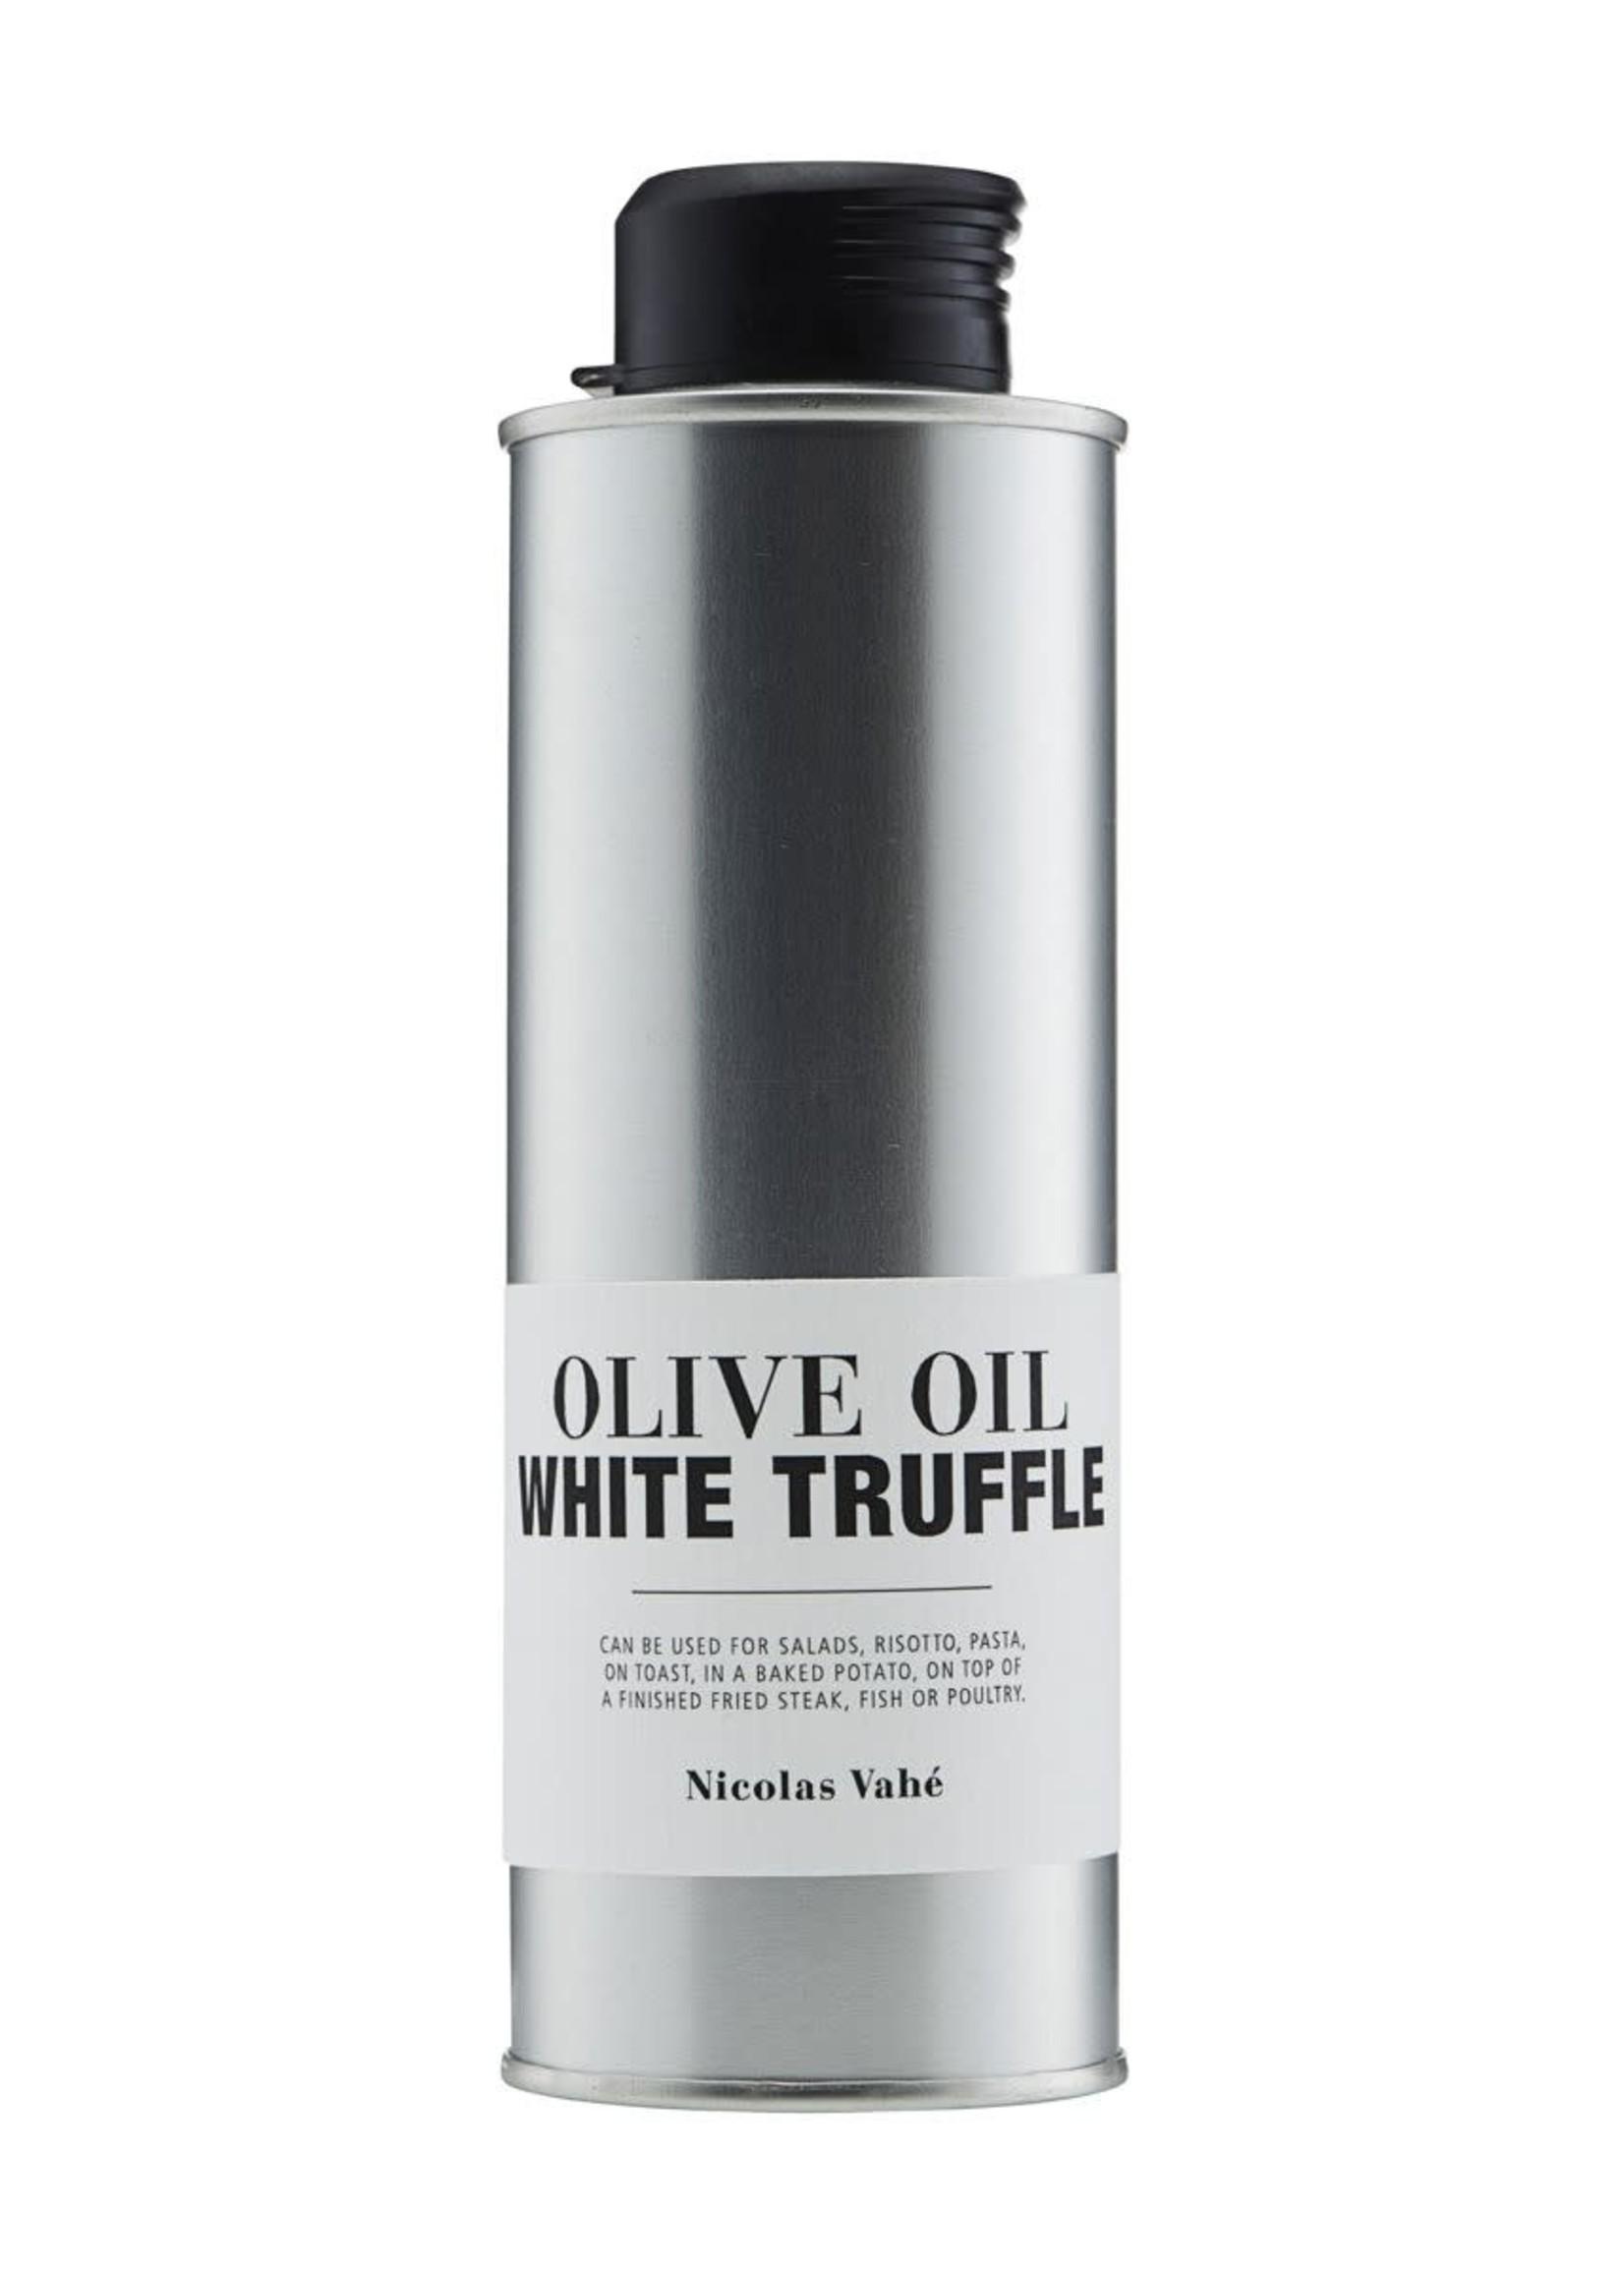 Nicolas Vahé Virgin olive oil with white truffle